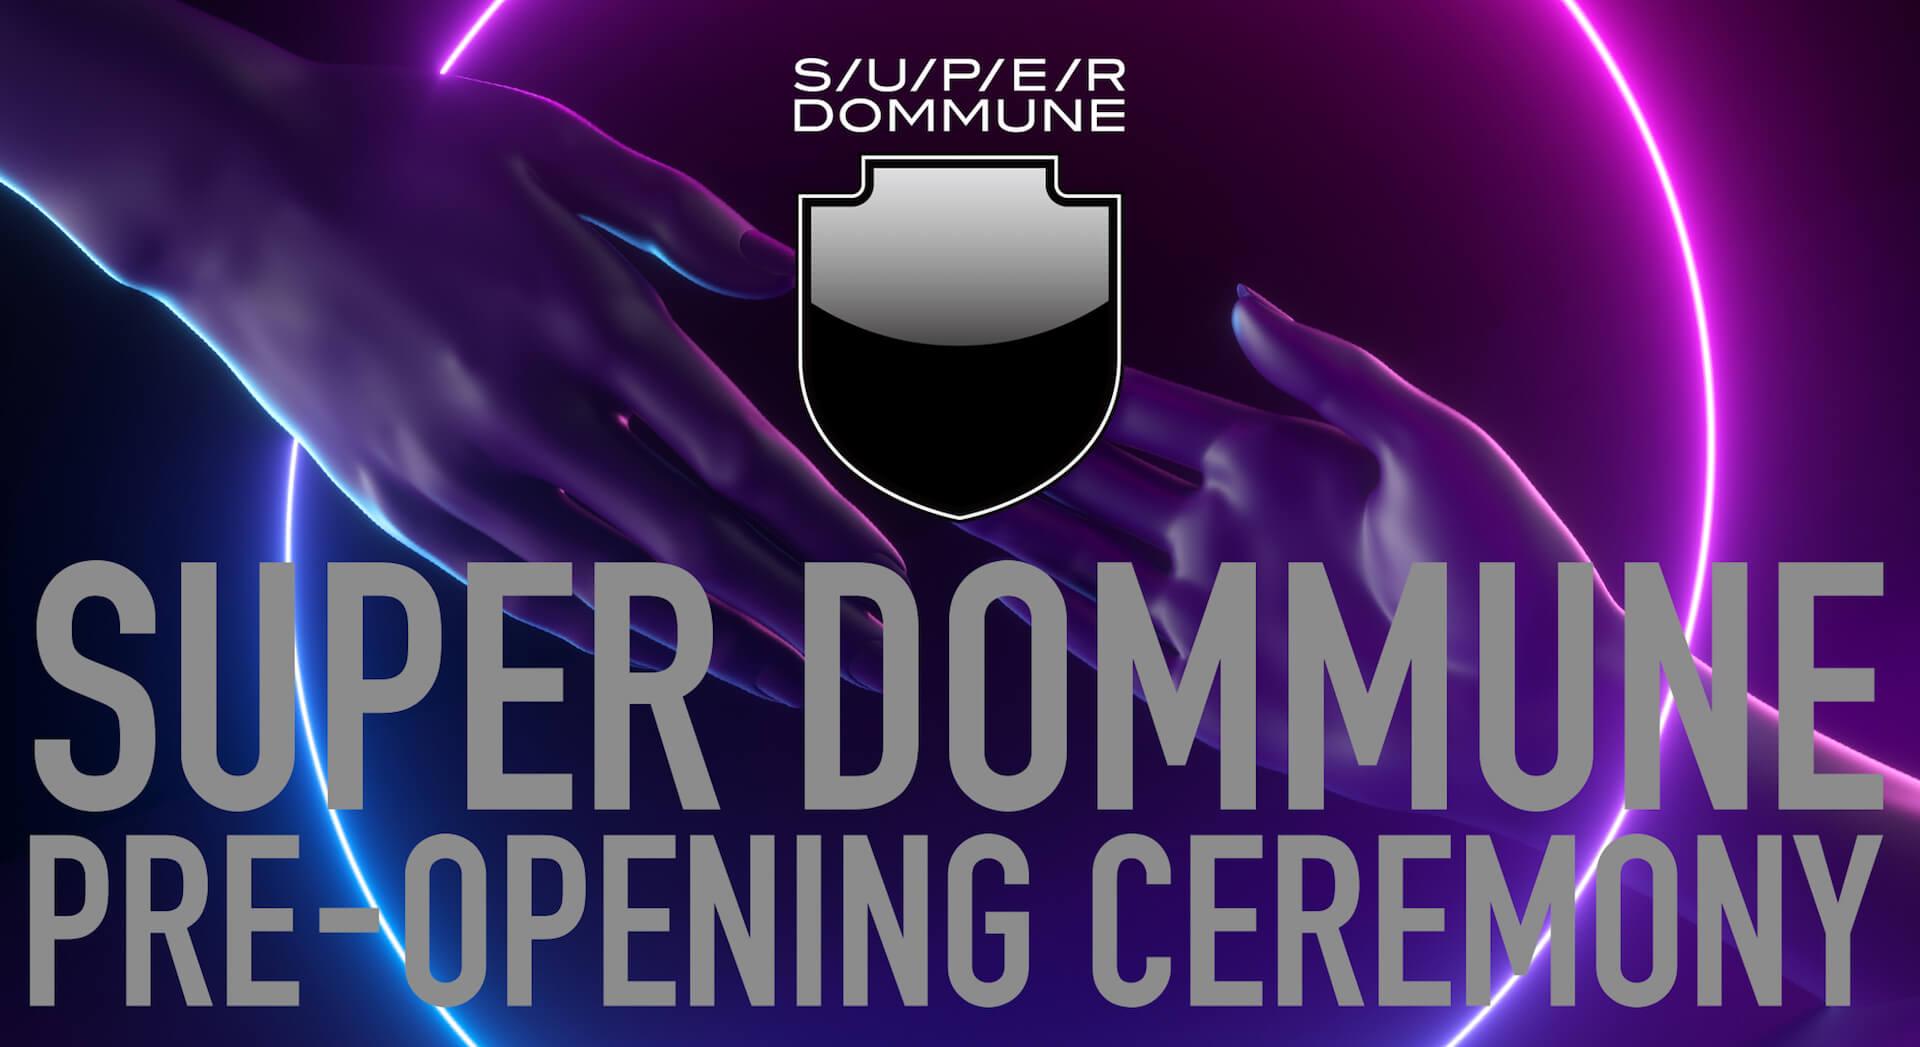 DOMMUNEが渋谷PARCO9階のクリエイティヴスタジオに移転、SUPER DOMMUNEとして進化|本日からプレオープニングセレモニーが開催 music191122-superdommune-2